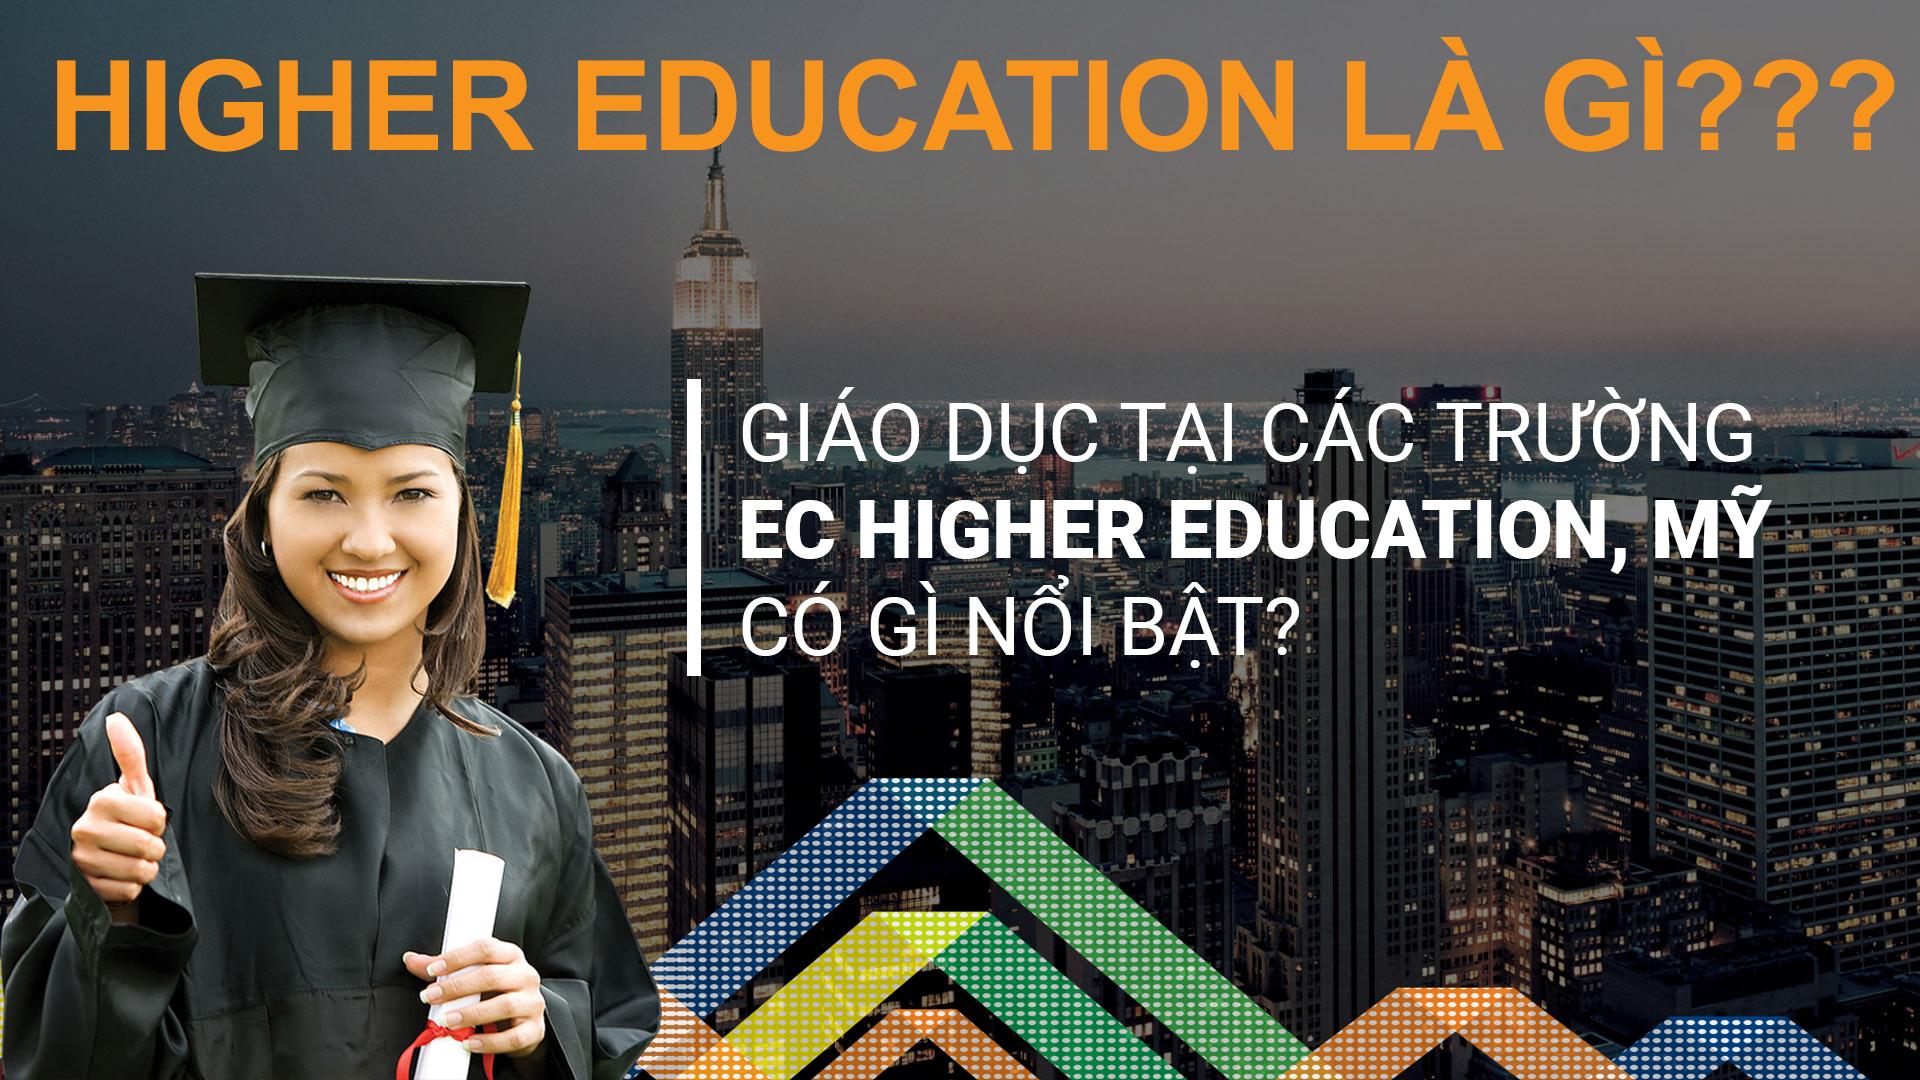 Higher education la gi